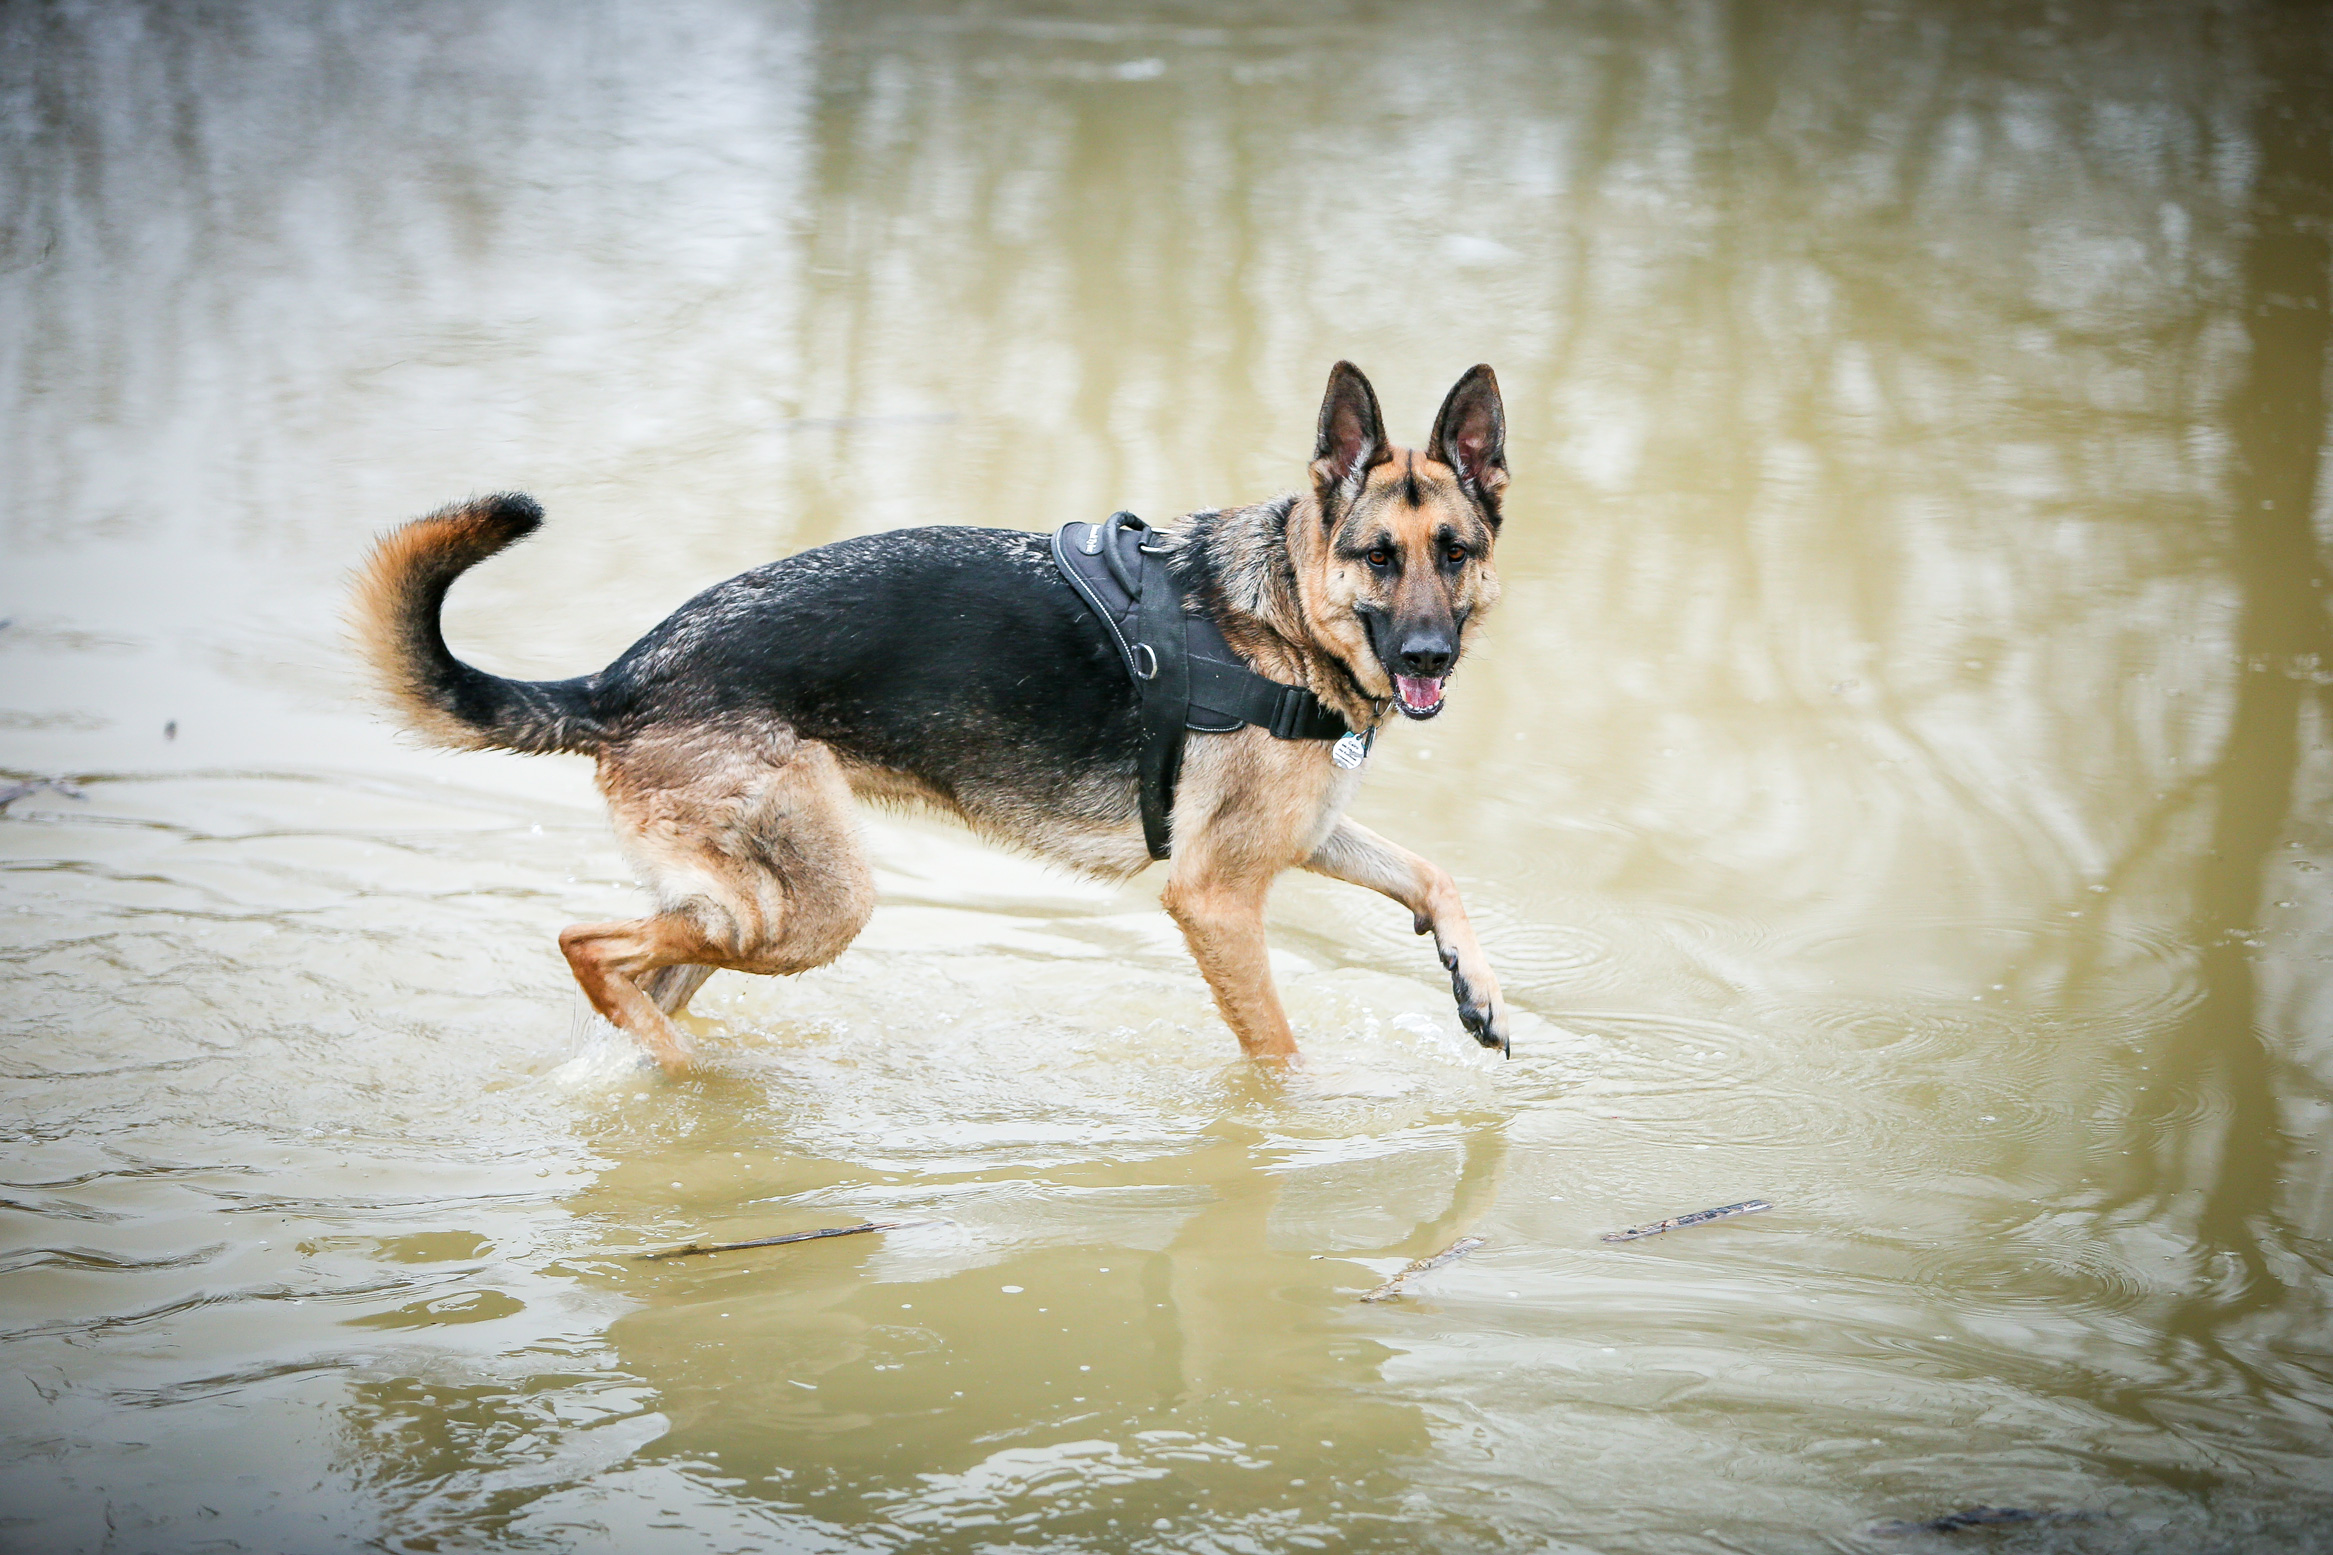 A German Shepard playing in water